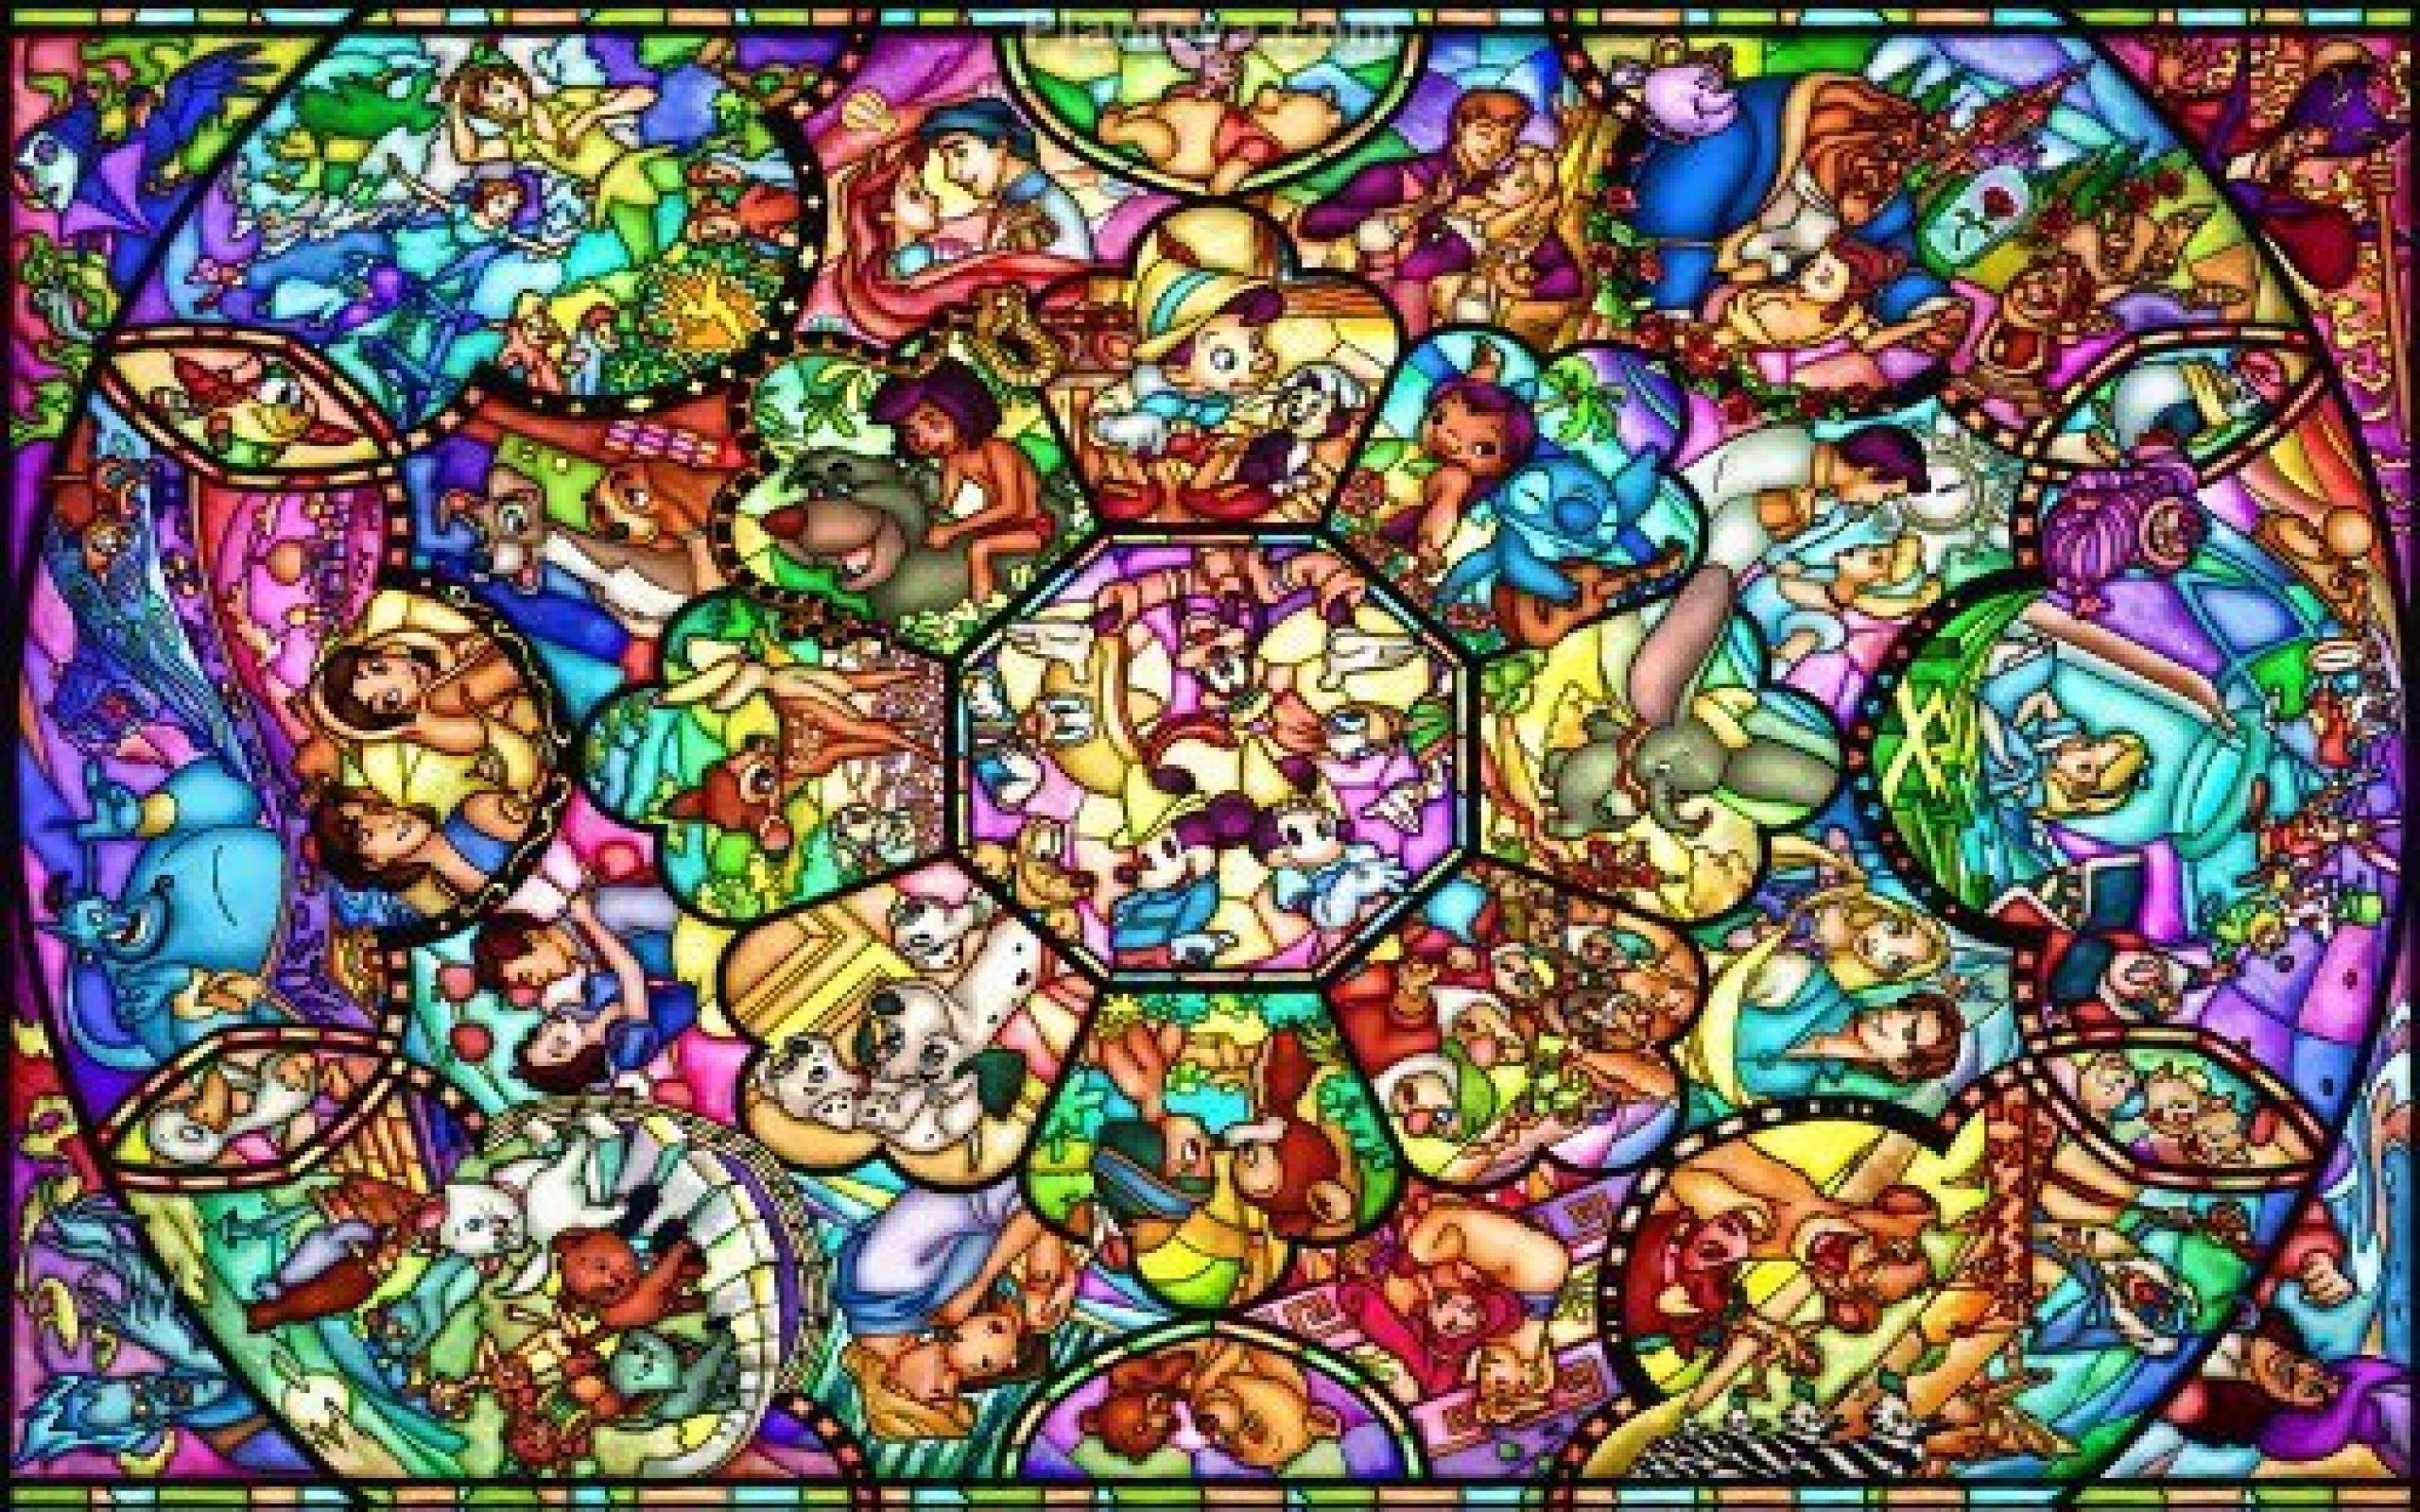 Disney Desktop Backgrounds Disney Stained Glass Diamond Painting 2560x1600 Wallpaper Teahub Io